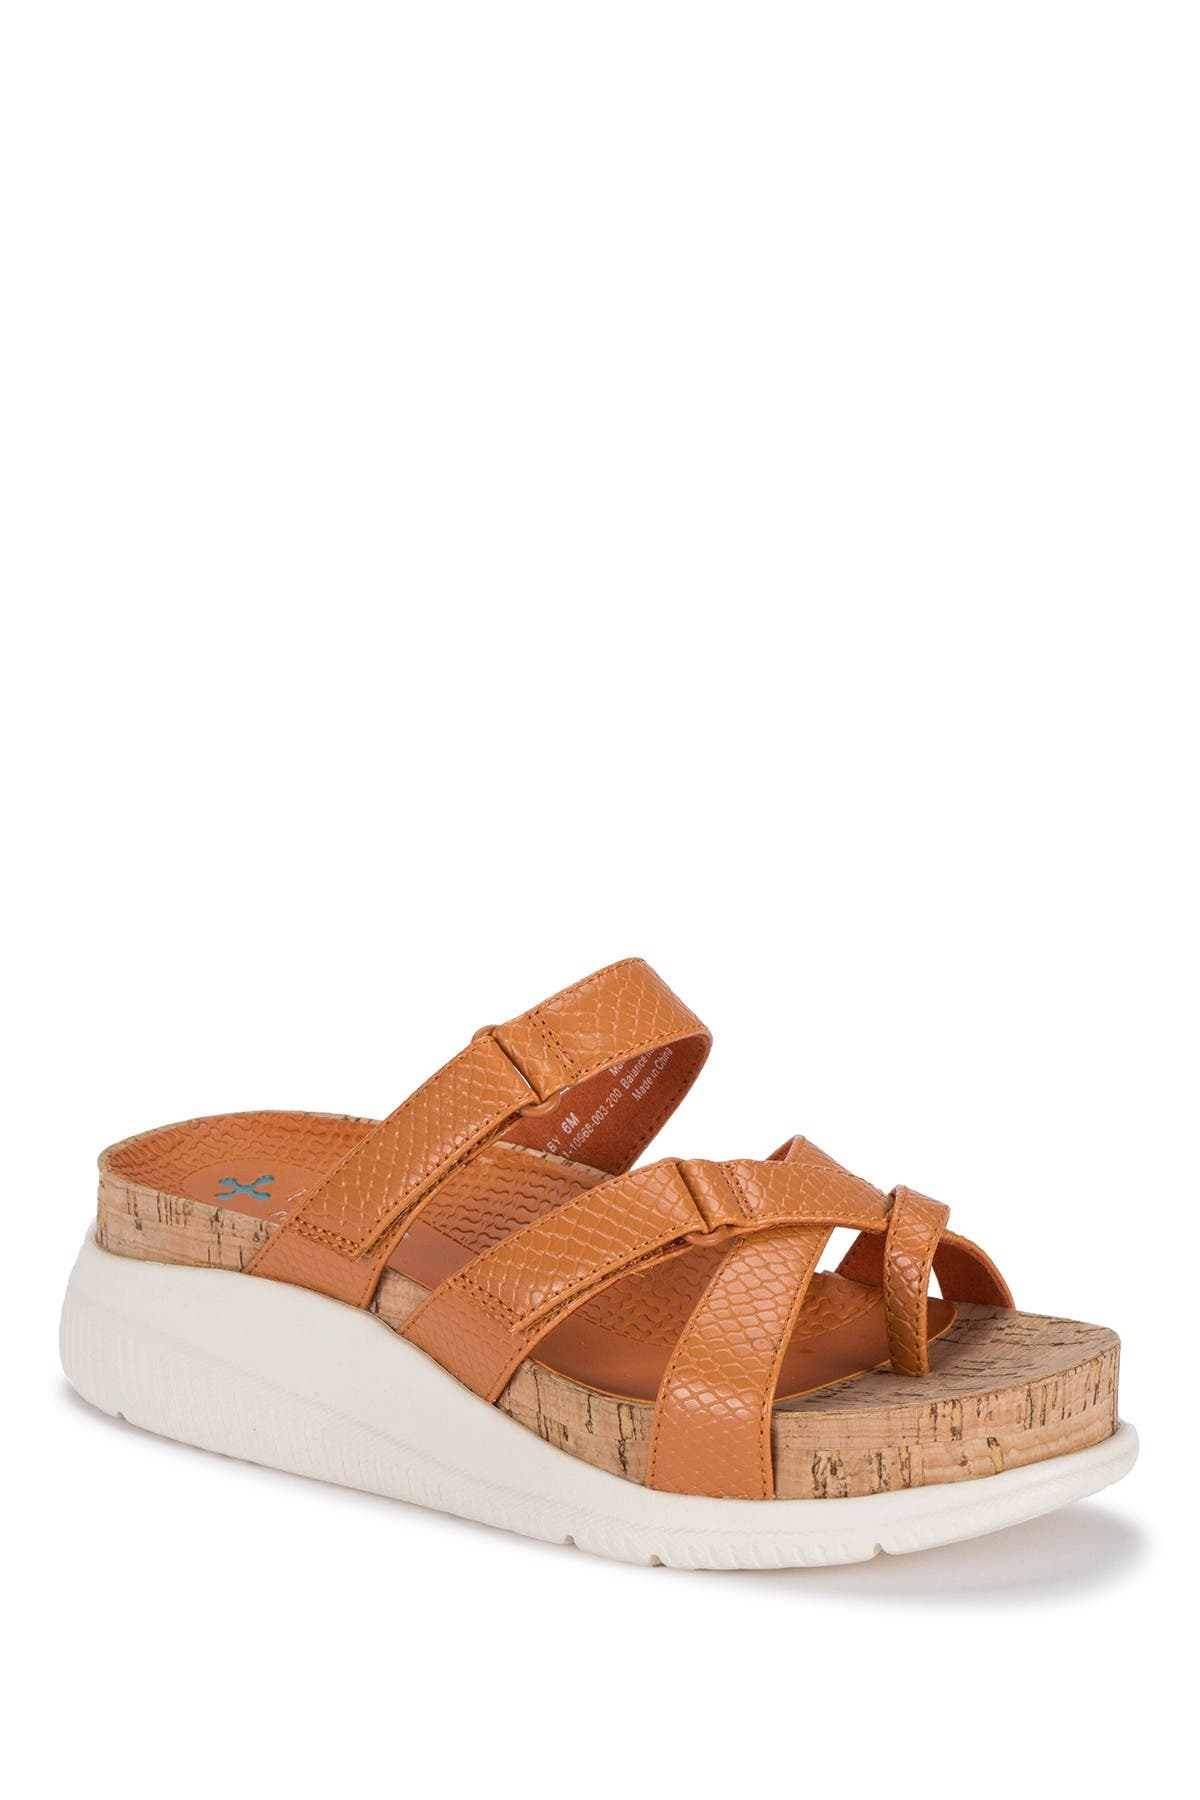 Image of BareTraps Selby Posture Plus Wedge Sandal